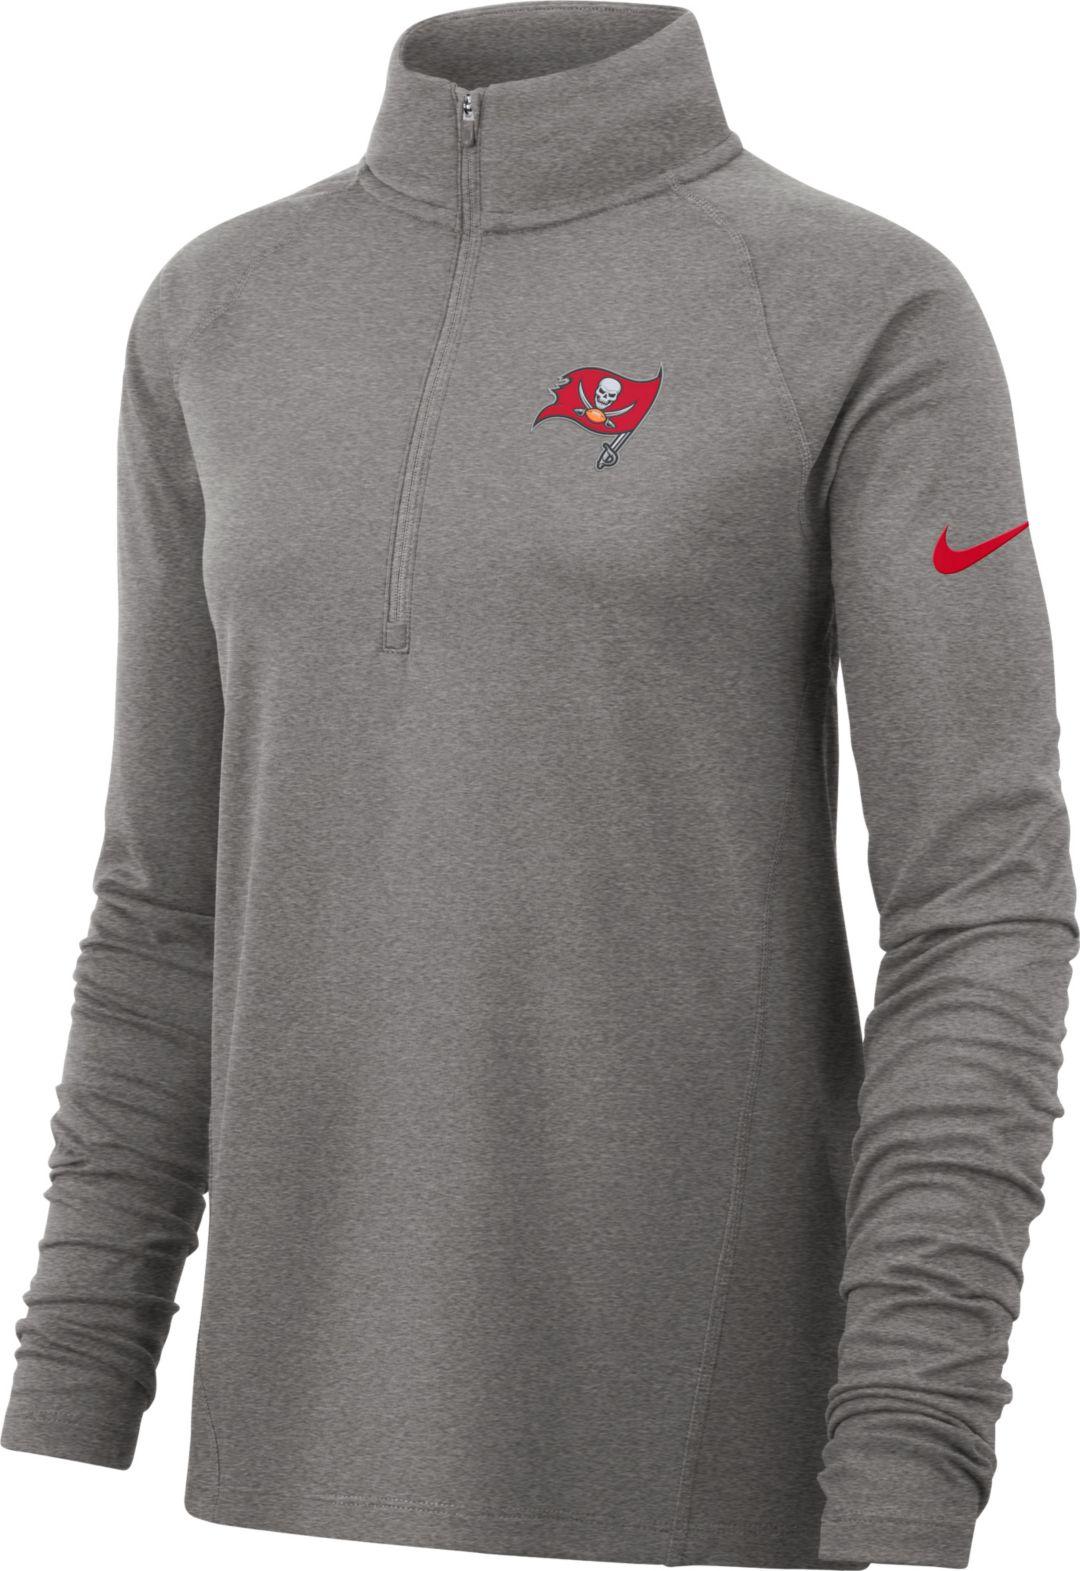 7e0551a4 Nike Women's Tampa Bay Buccaneers Core Grey Half-Zip Performance Pullover